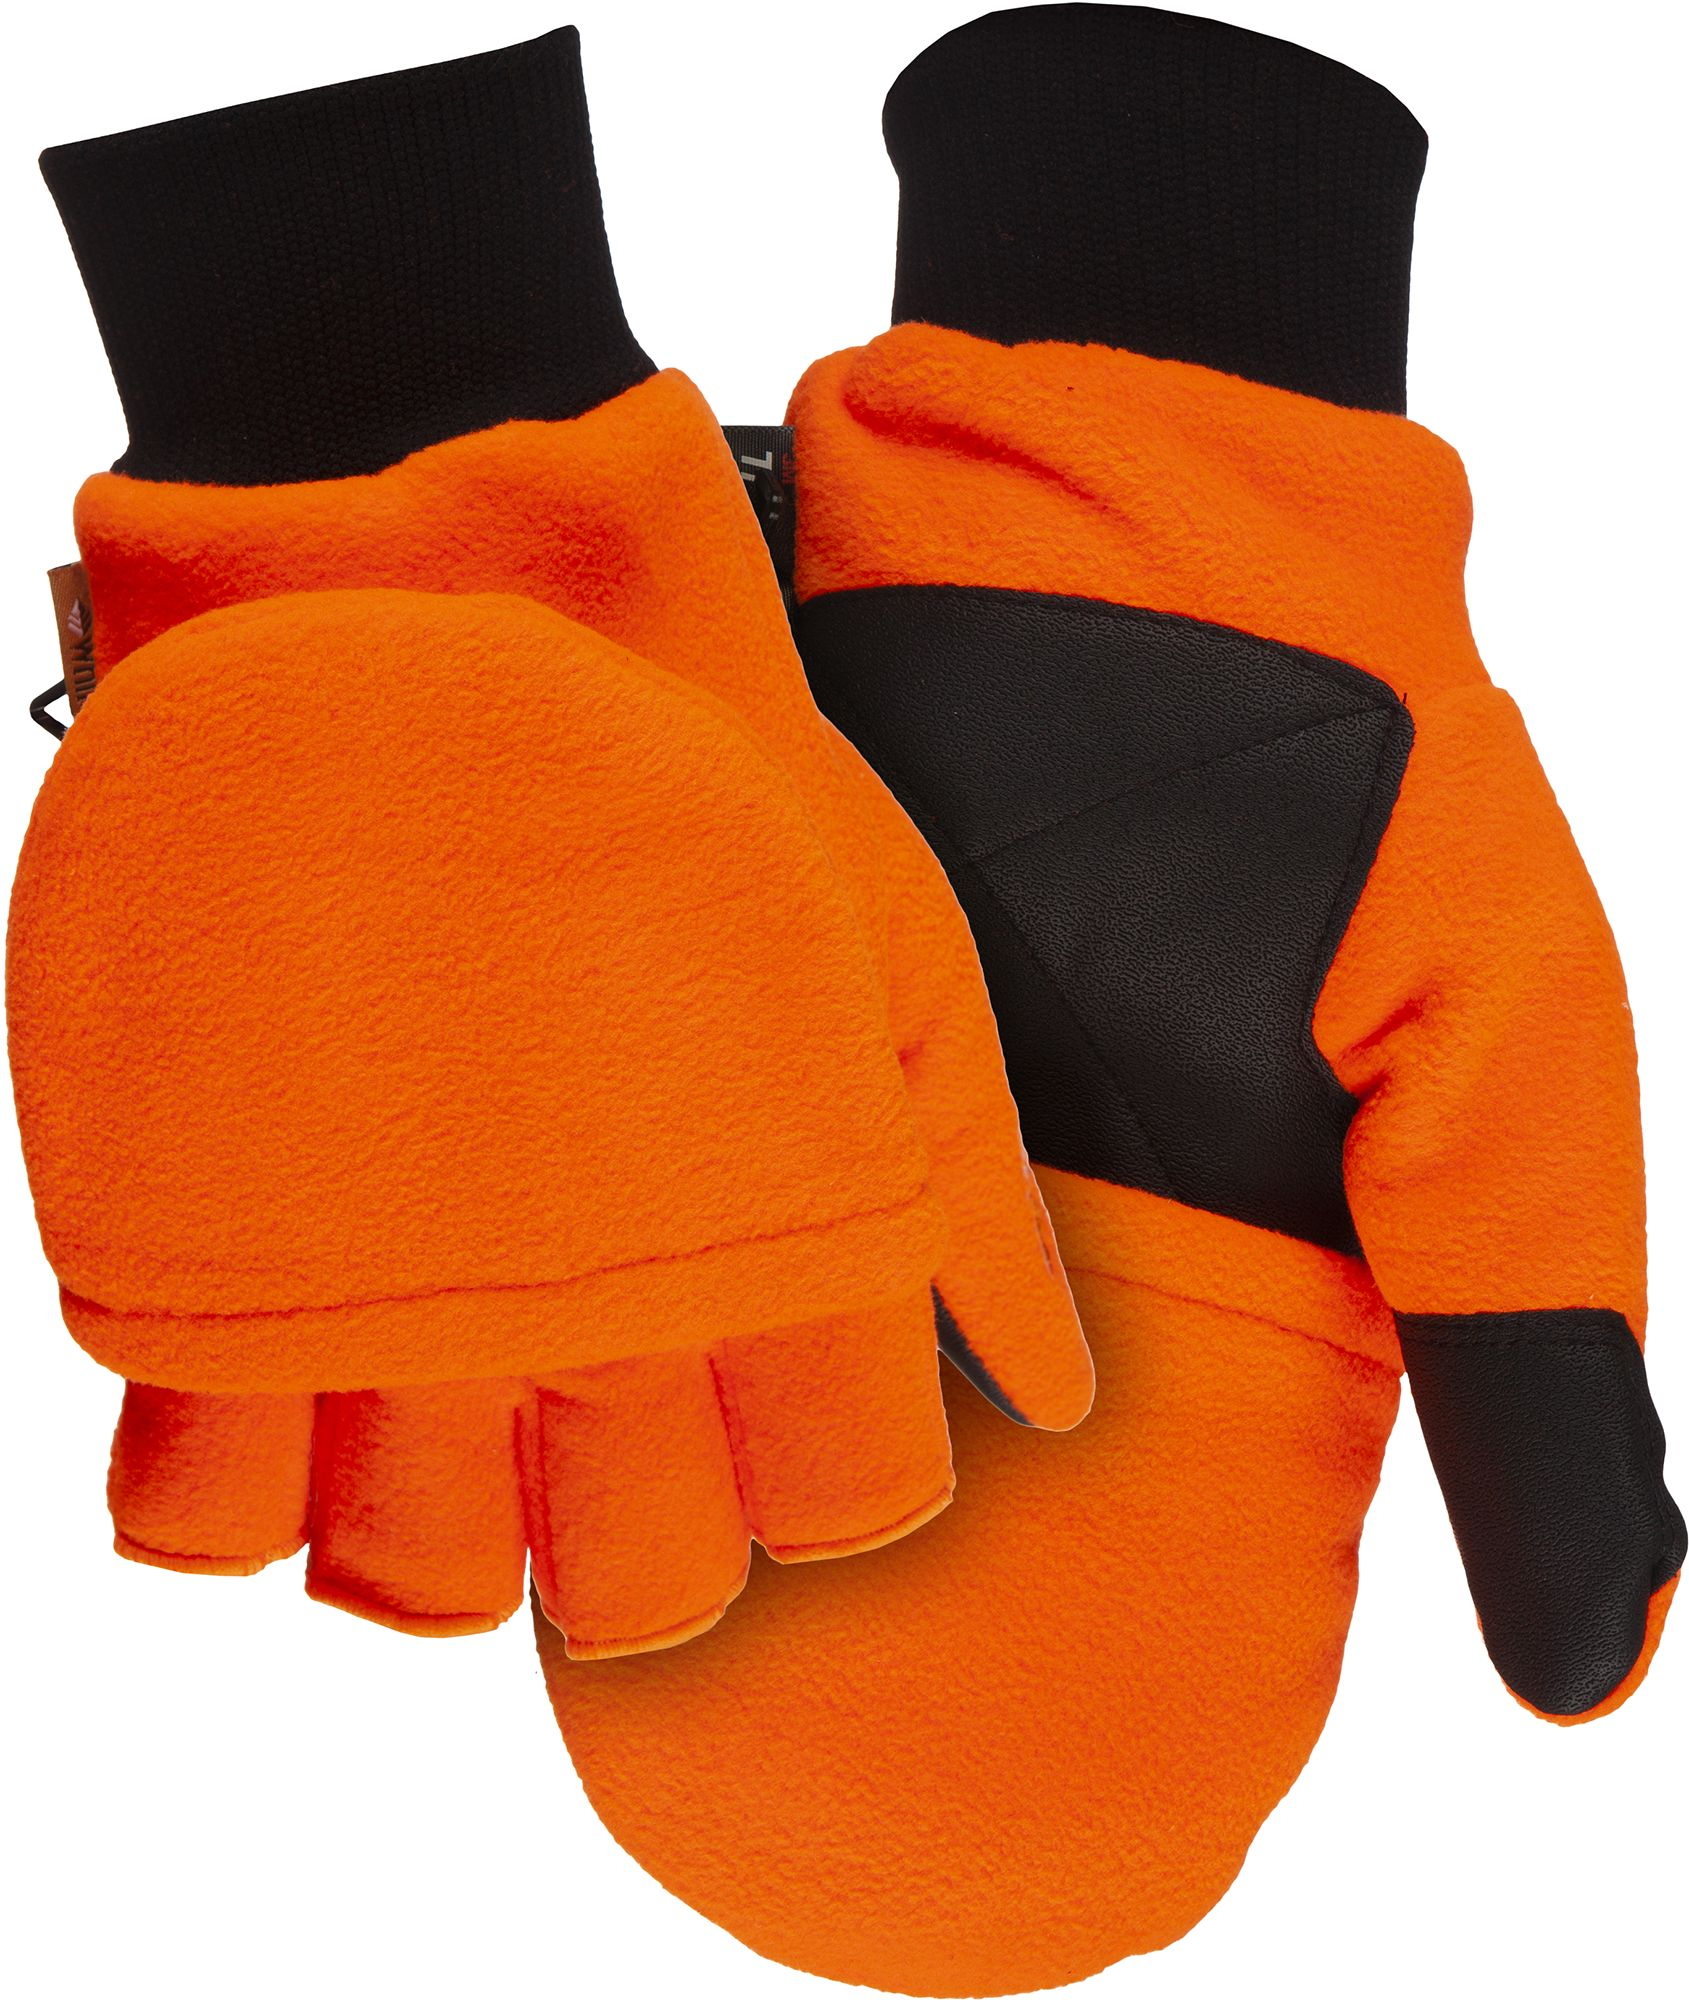 Blocker Outdoors Youth Fleece Glo-Mitt, Kids Unisex, Size: One size, Blaze Orange thumbnail